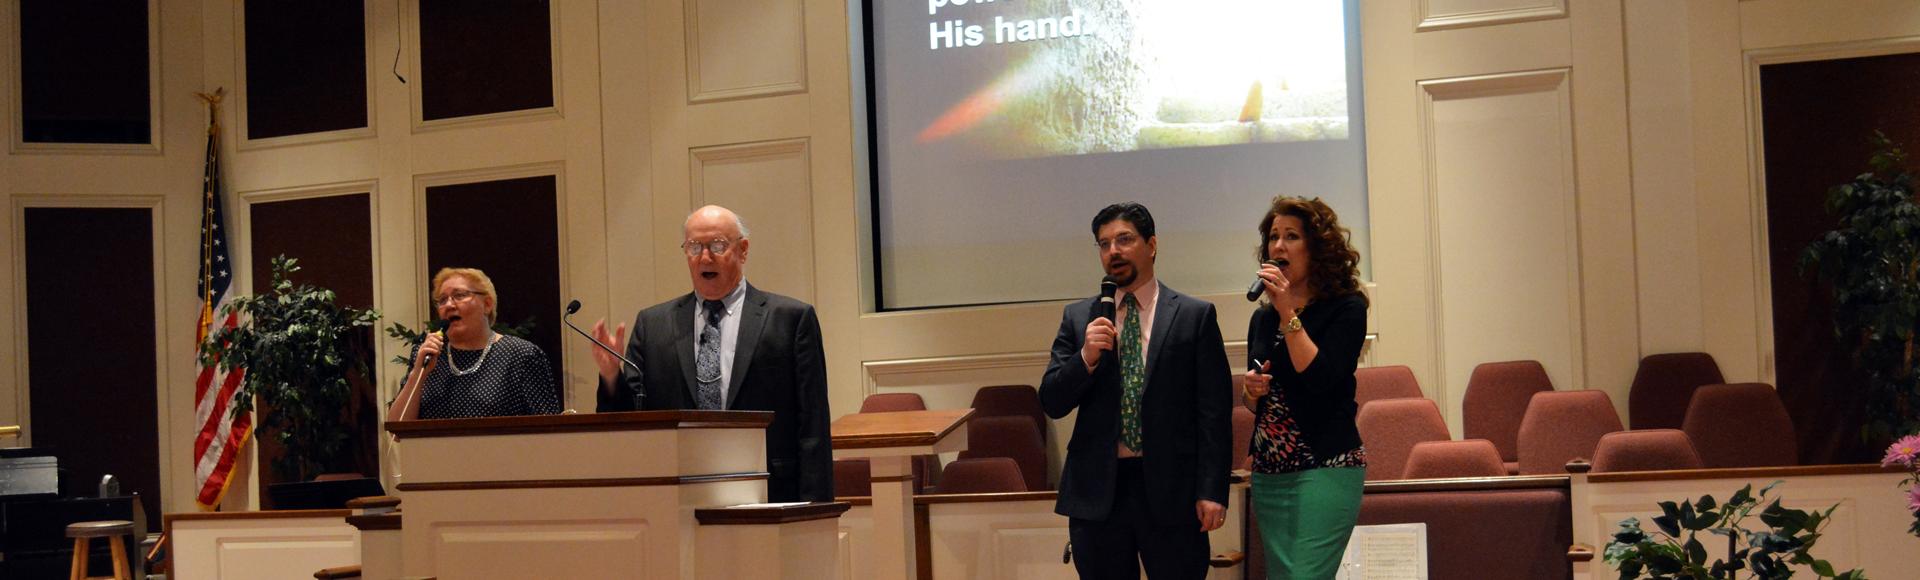 nottingham-baptist-service